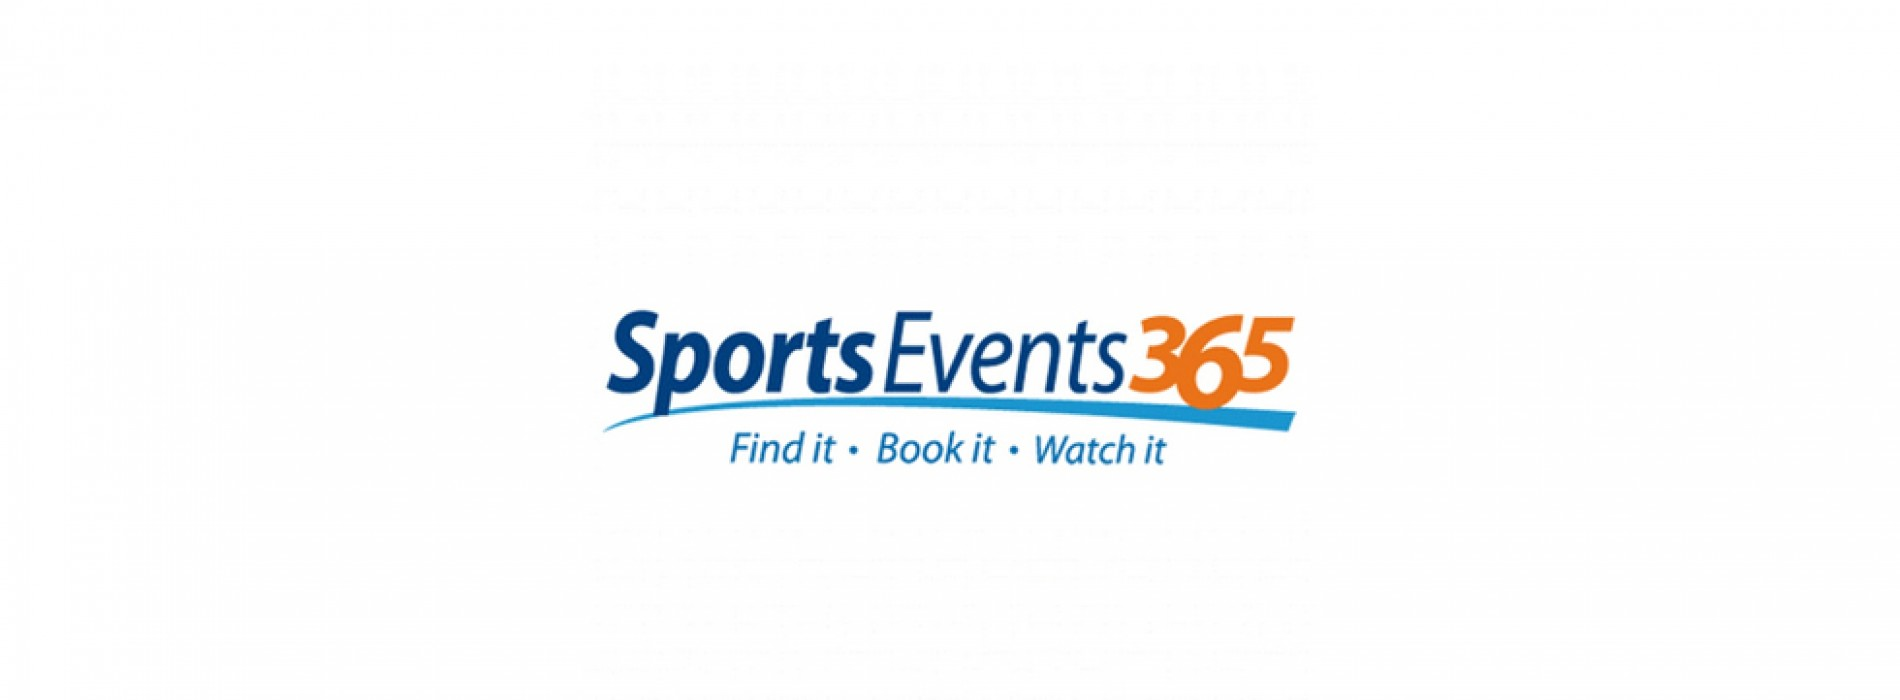 Sports Events 365 showcases B2B partnership portfolio for travel companies at FITUR 2018